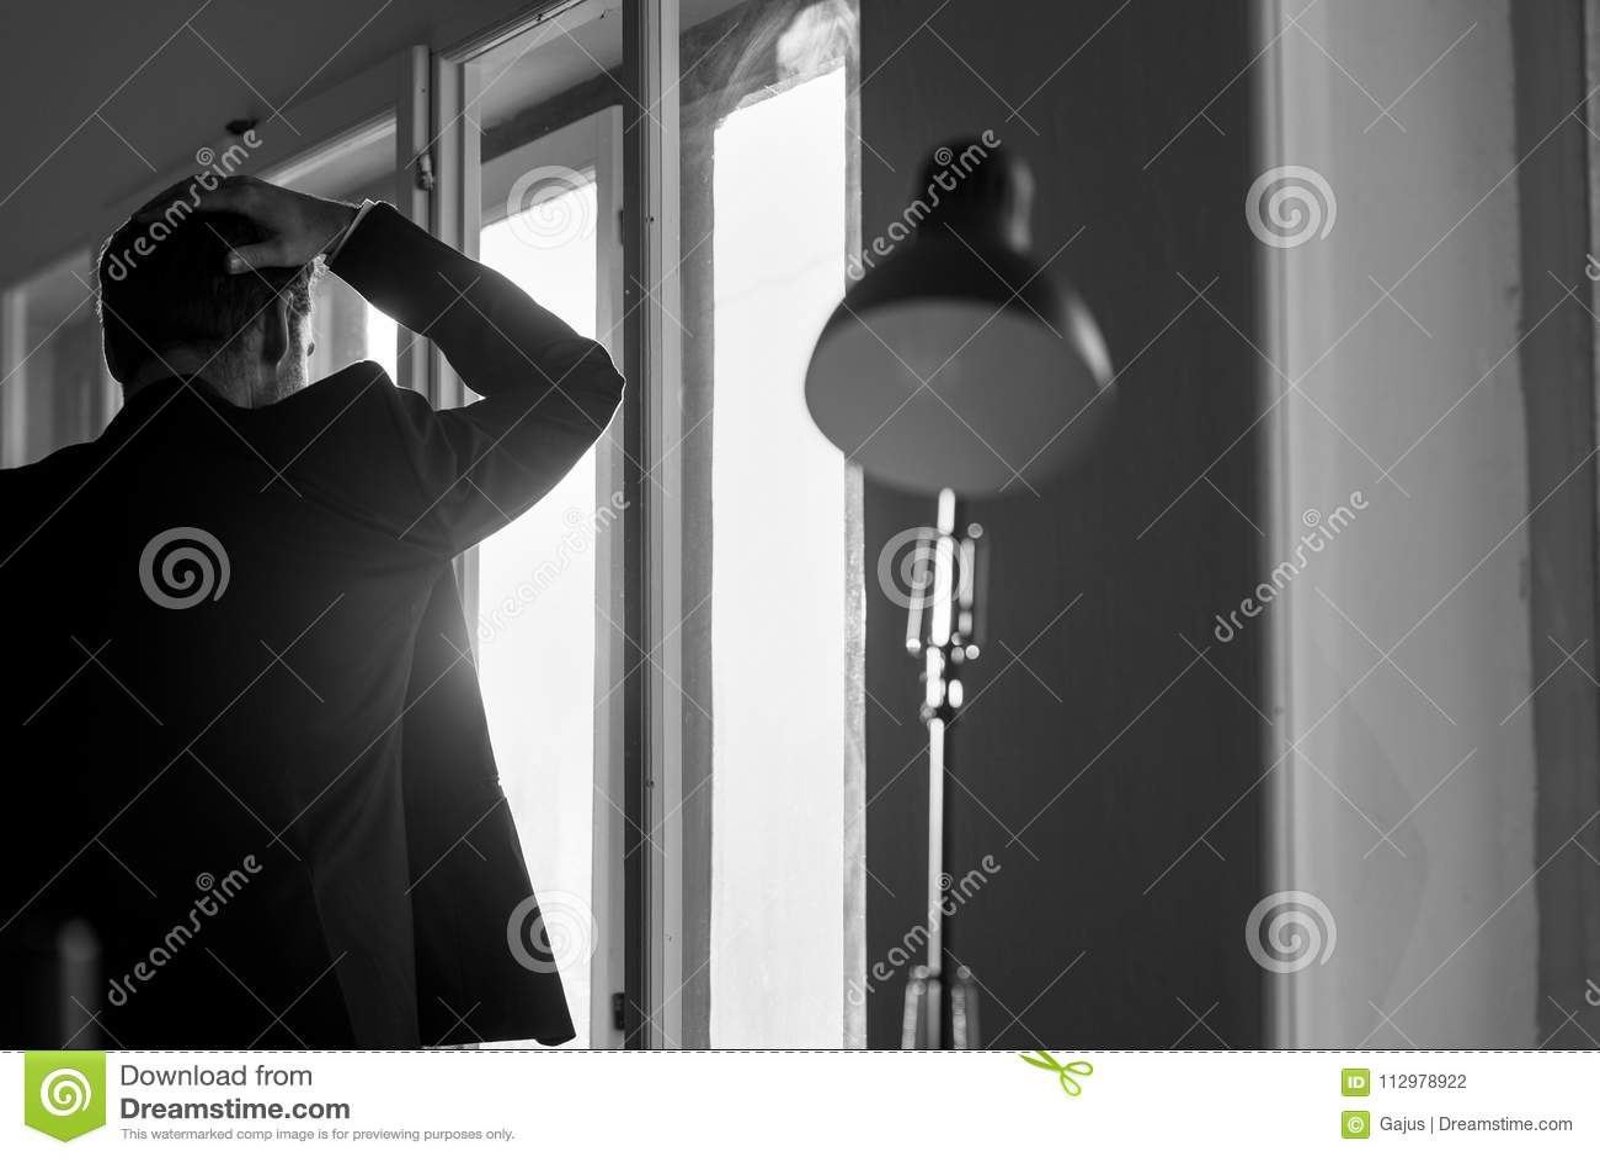 Depressed businessman in black business suit